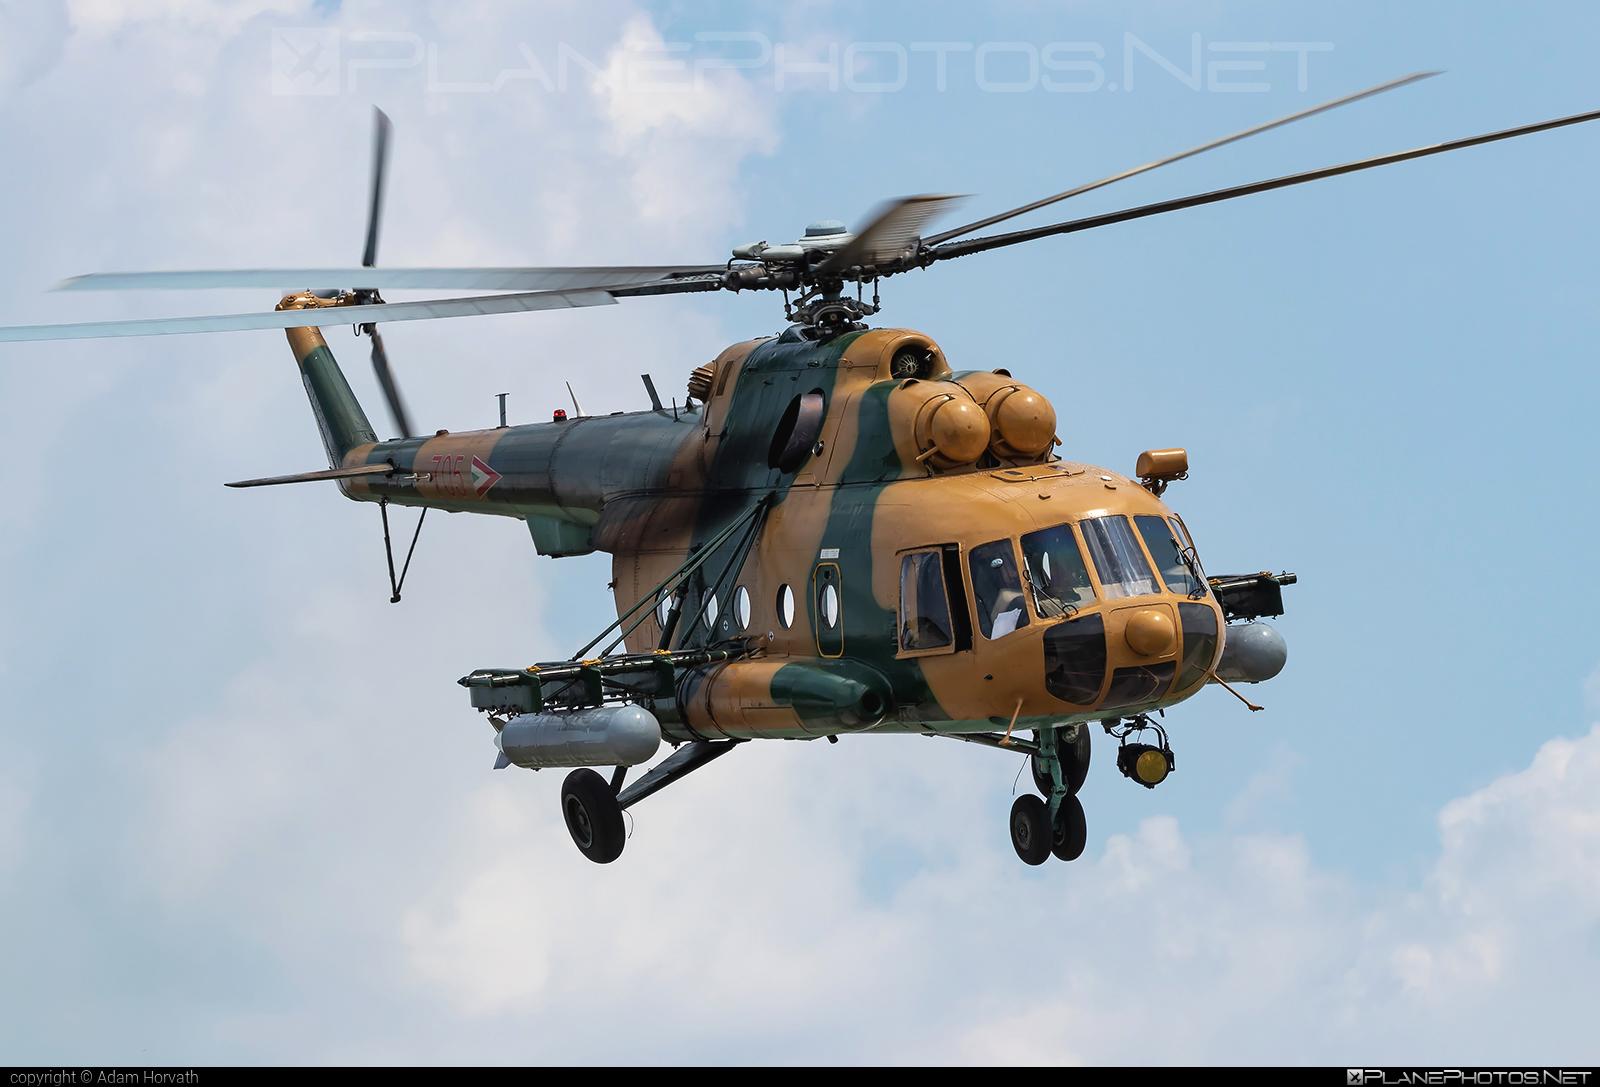 Mil Mi-17 - 705 operated by Magyar Légierő (Hungarian Air Force) #hungarianairforce #magyarlegiero #mi17 #mil #mil17 #milhelicopters